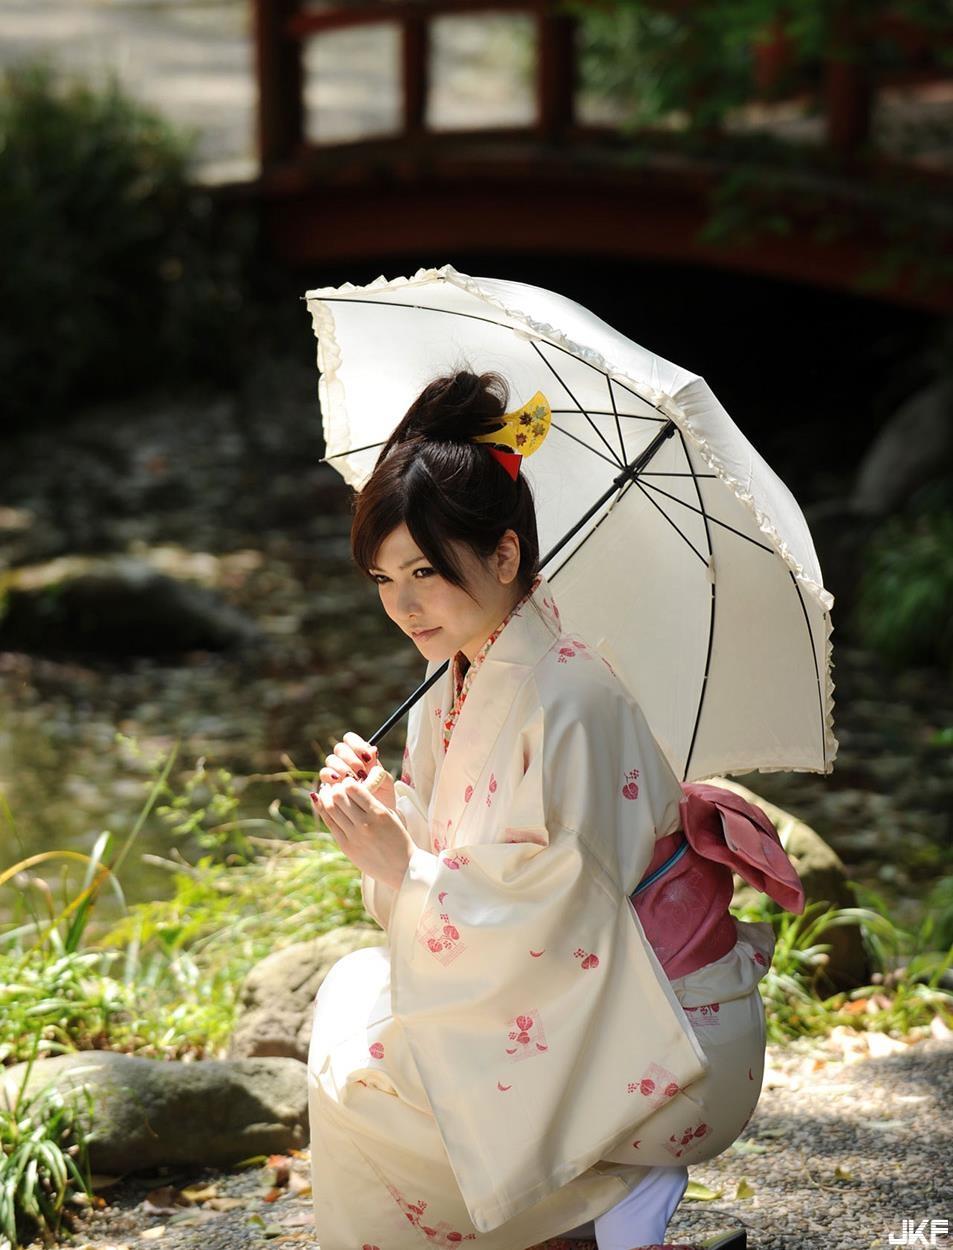 okita_anri_160806_021.jpg